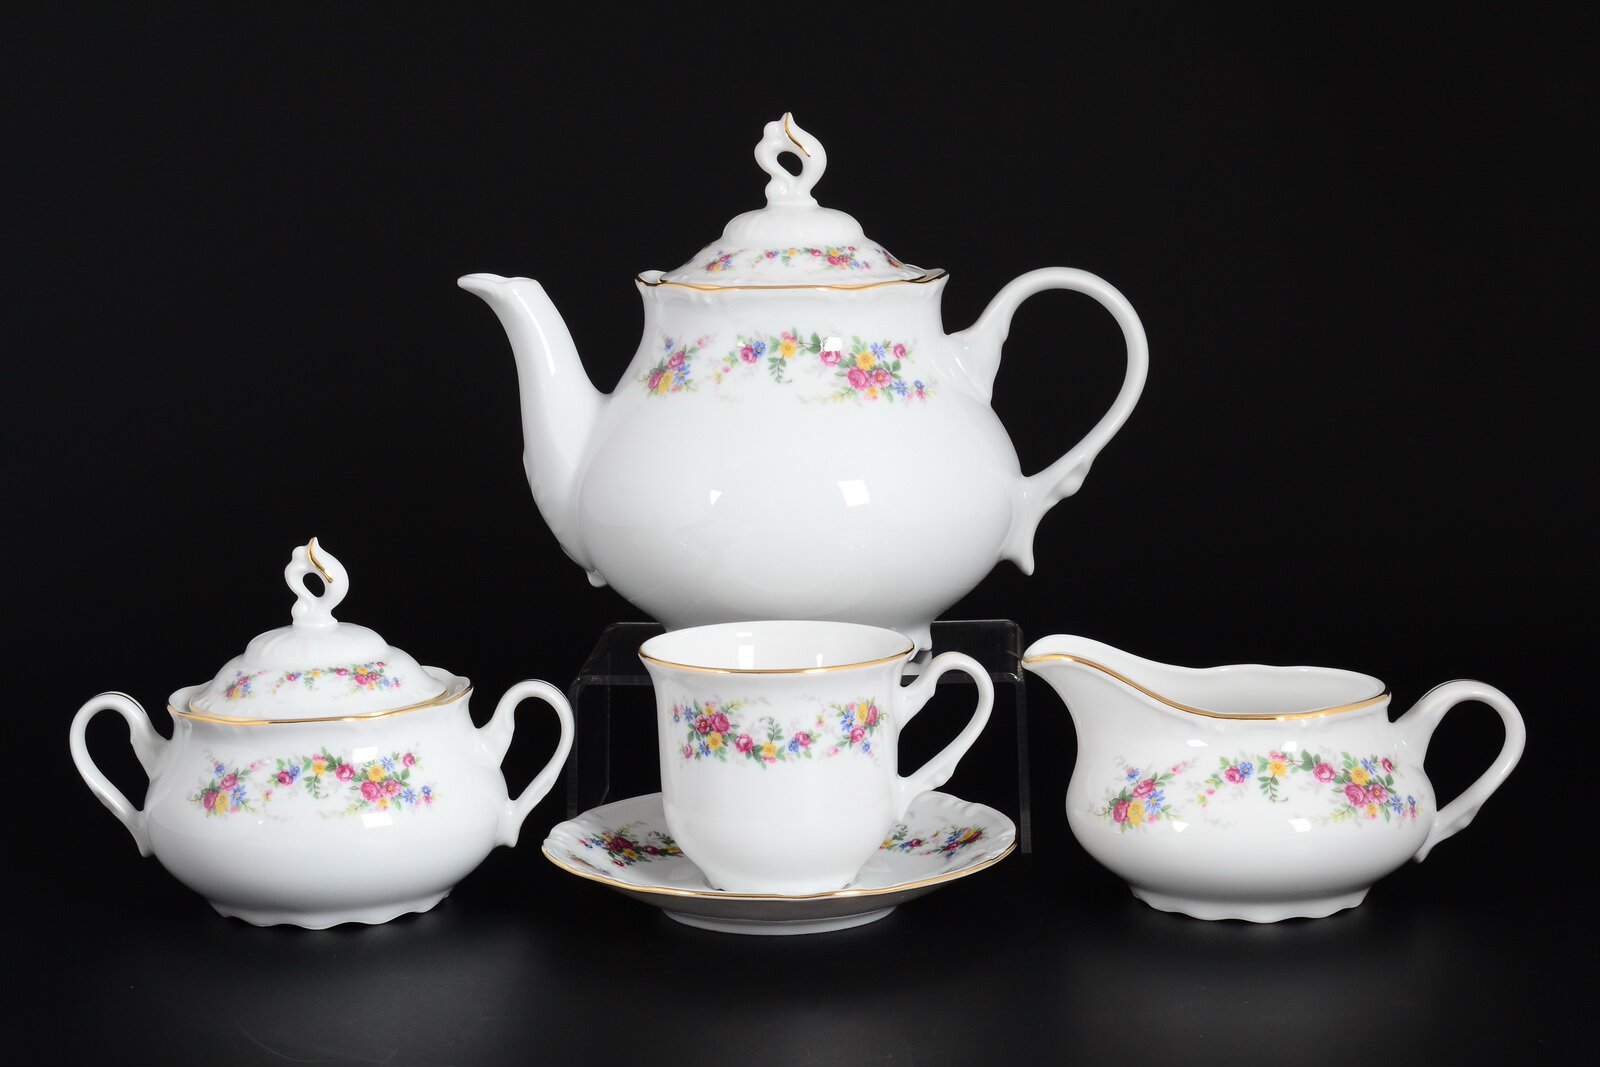 Чайный сервиз КОНСТАНЦИЯ ЦВЕТОЧНЫЙ САРАФАН от Thun 1794 a.s.